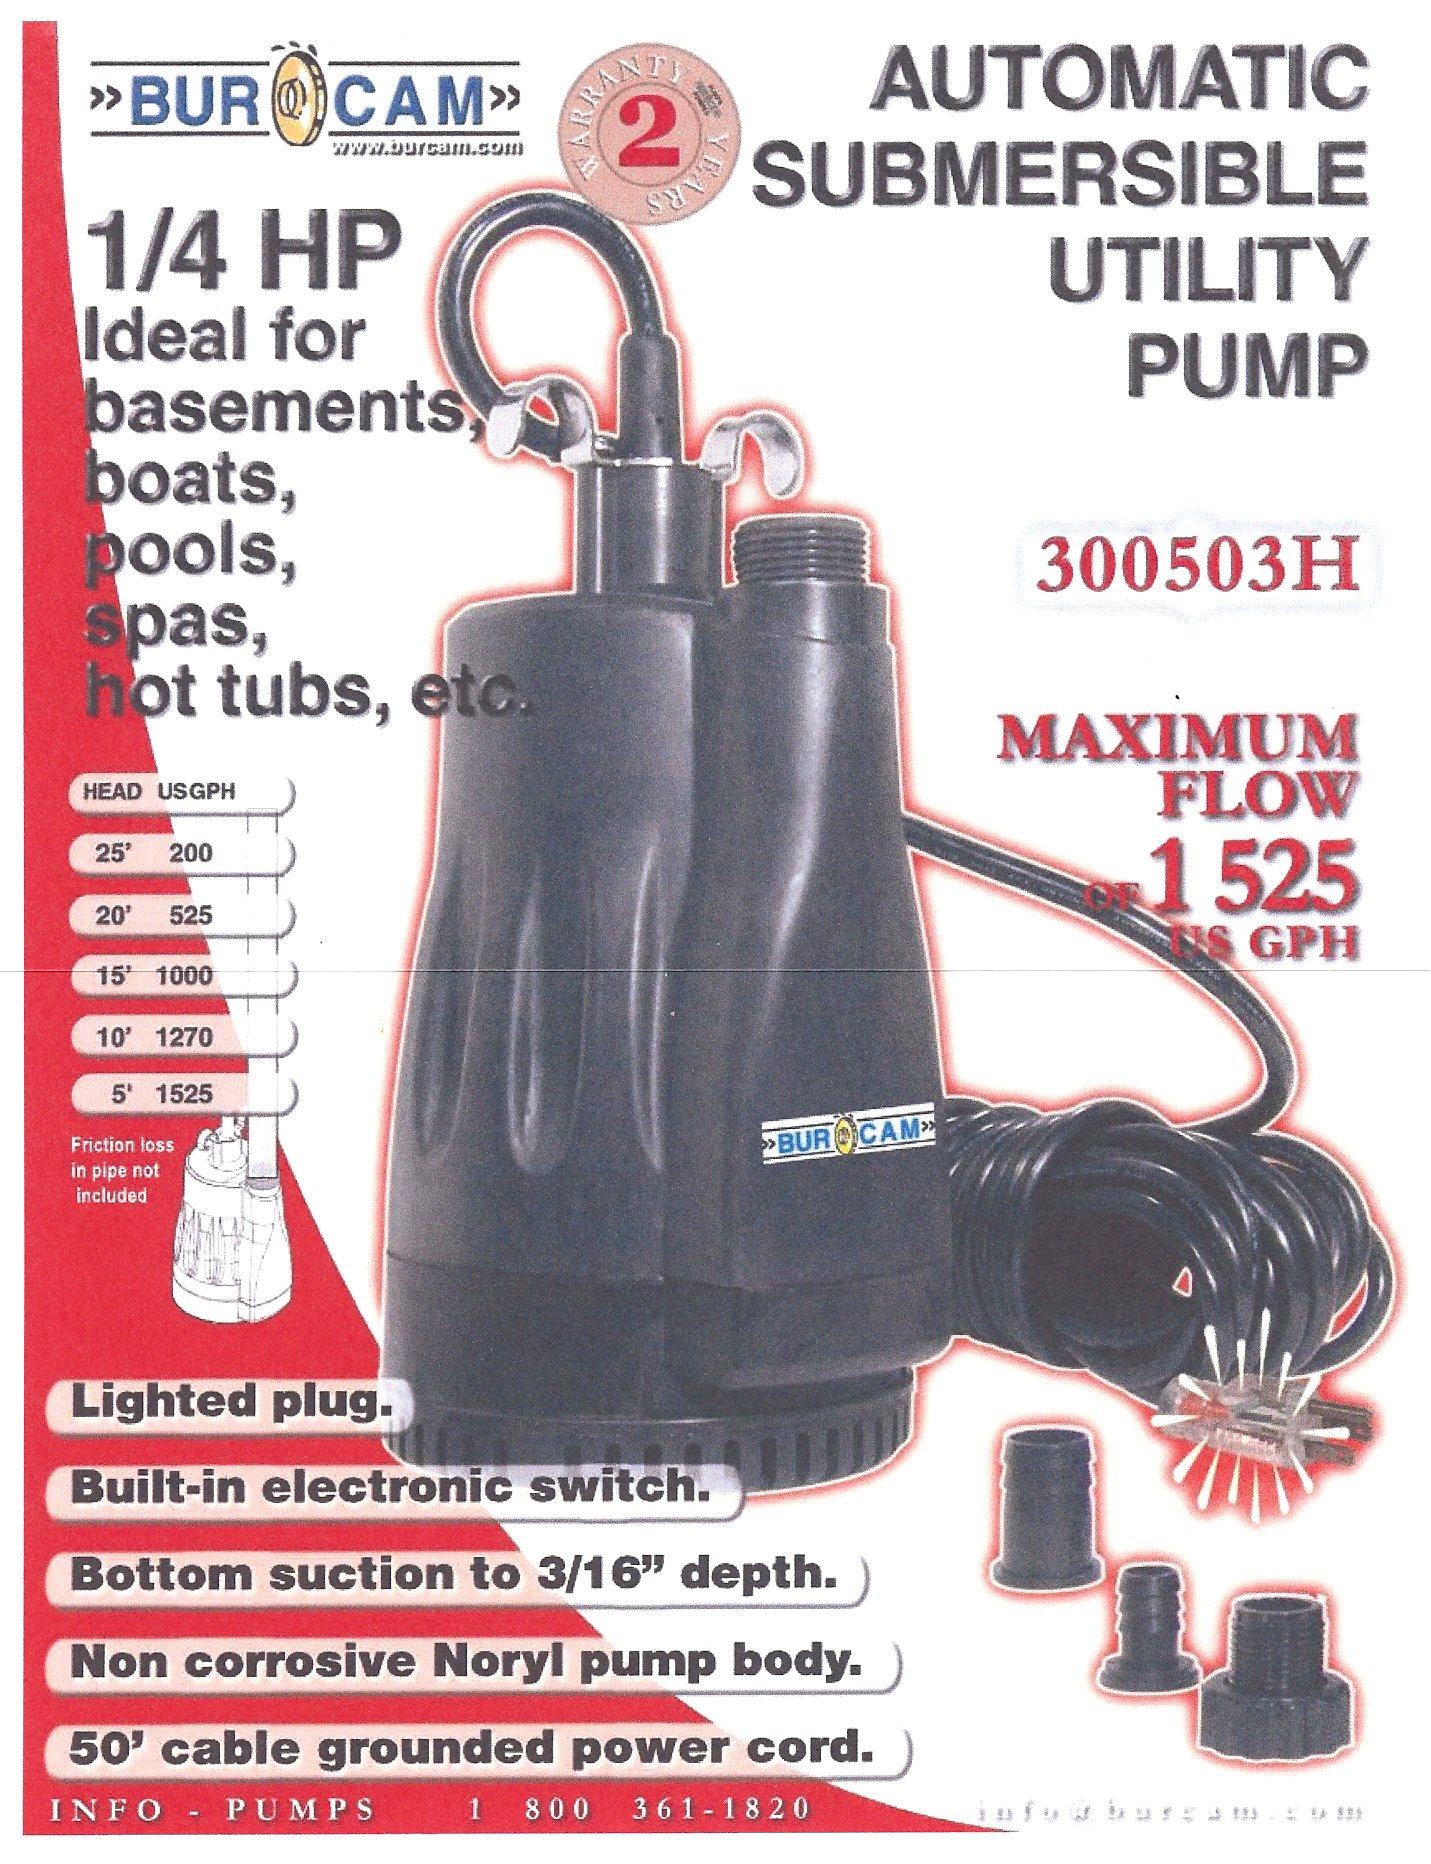 BurCam 300503H Automatic Submersible Utility Pump, 25 GPM, 1''